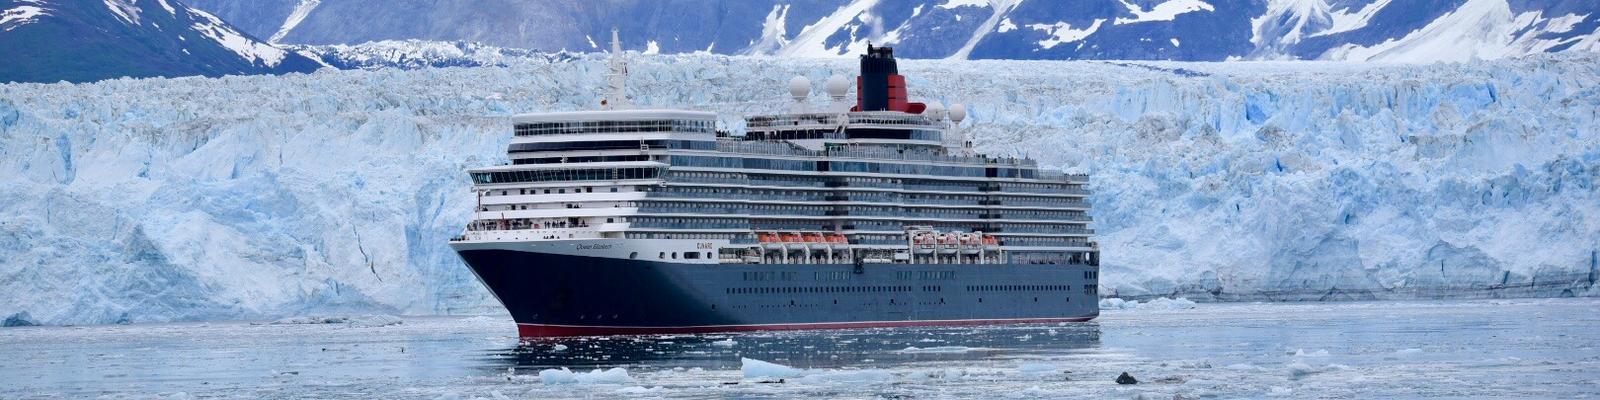 Queen Elizabeth (Photo:Christina Janansky/Cruise Critic)